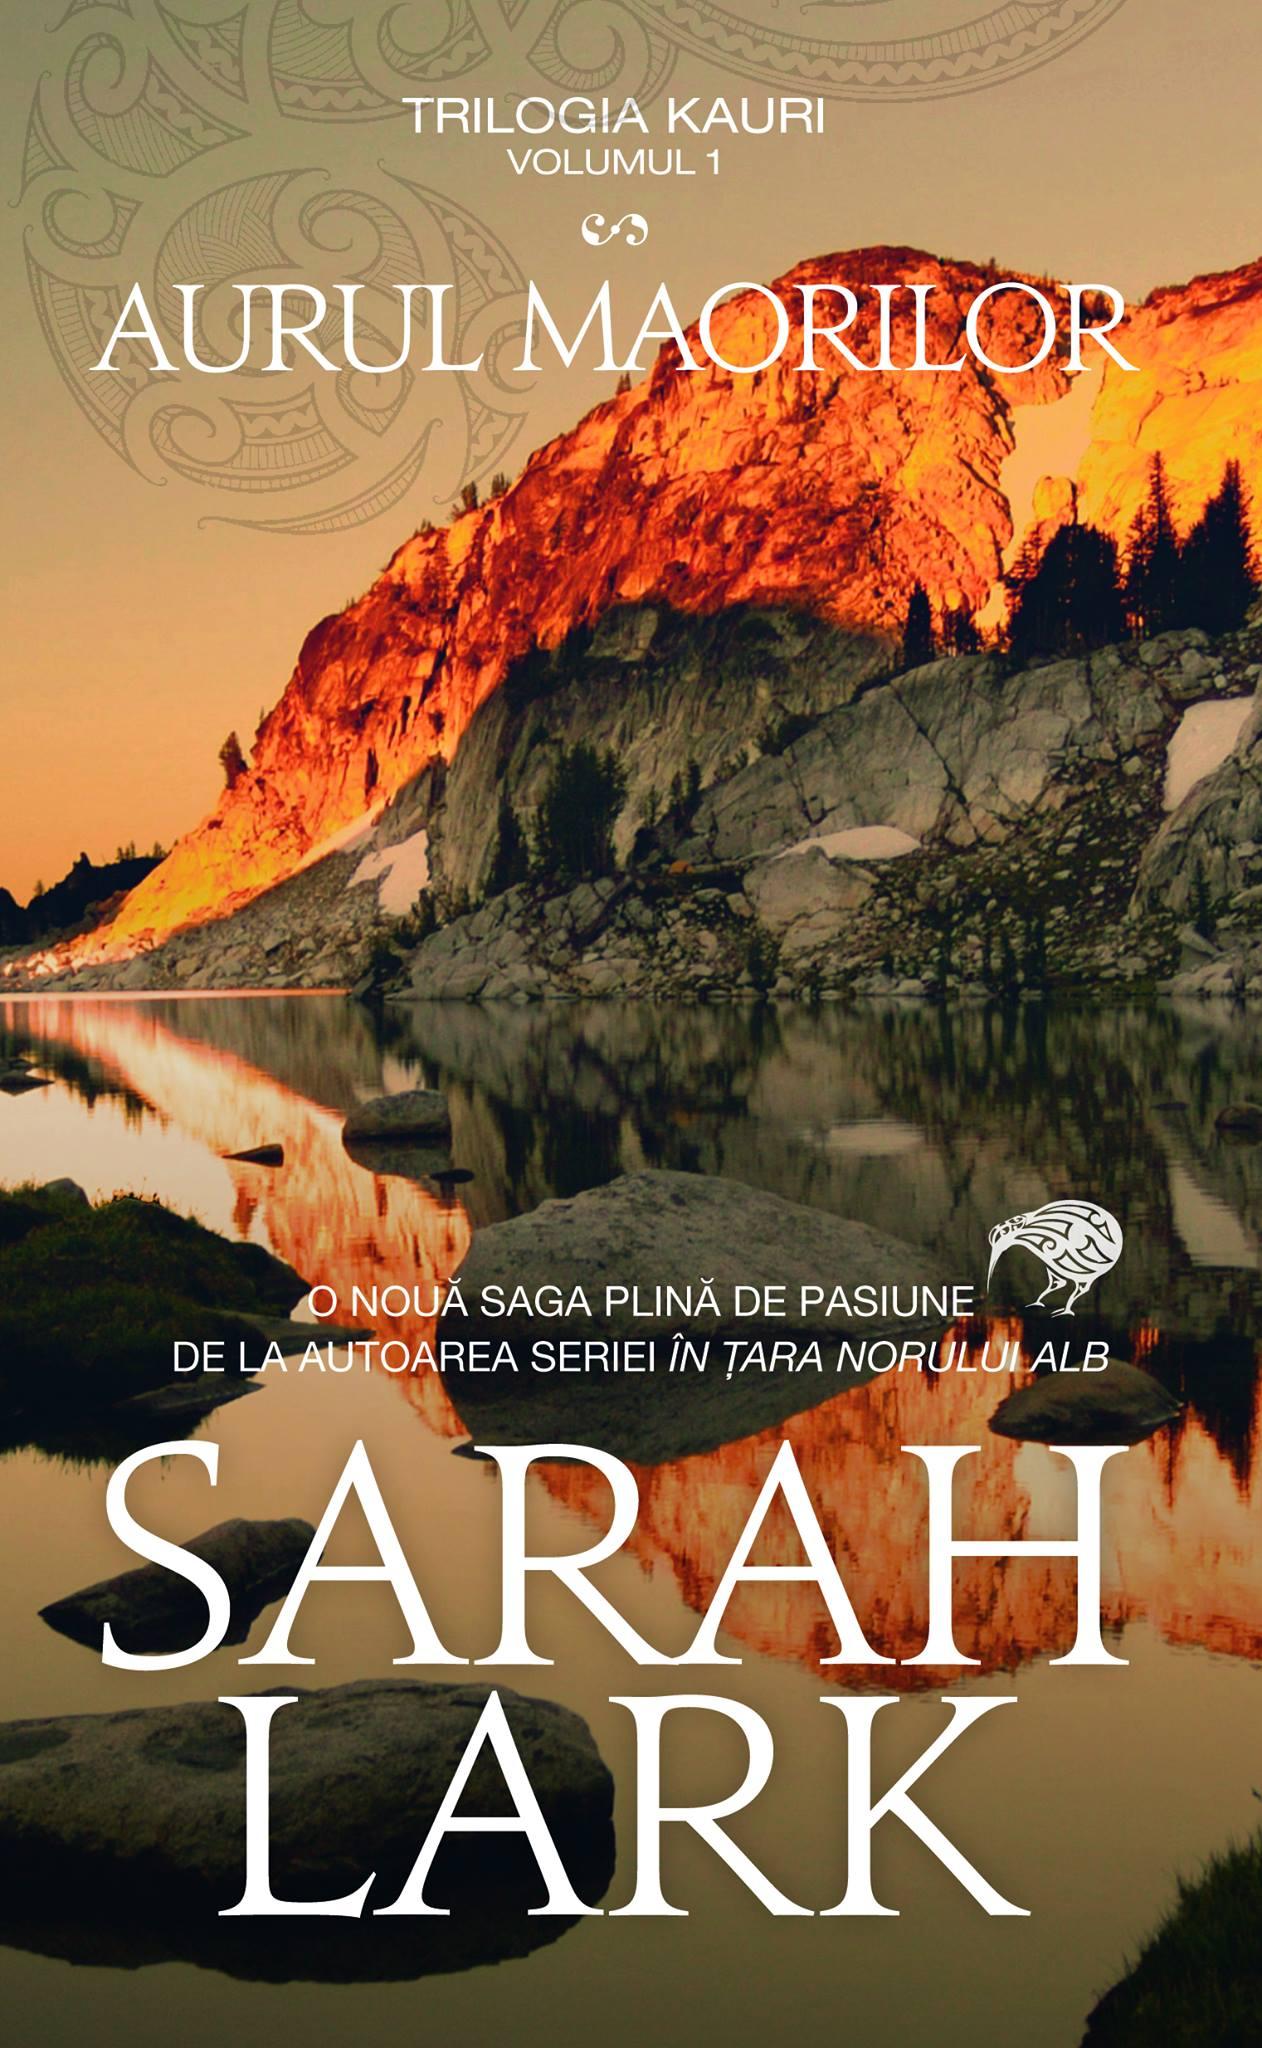 Aurul Maorilor de Sarah Lark - recenzie